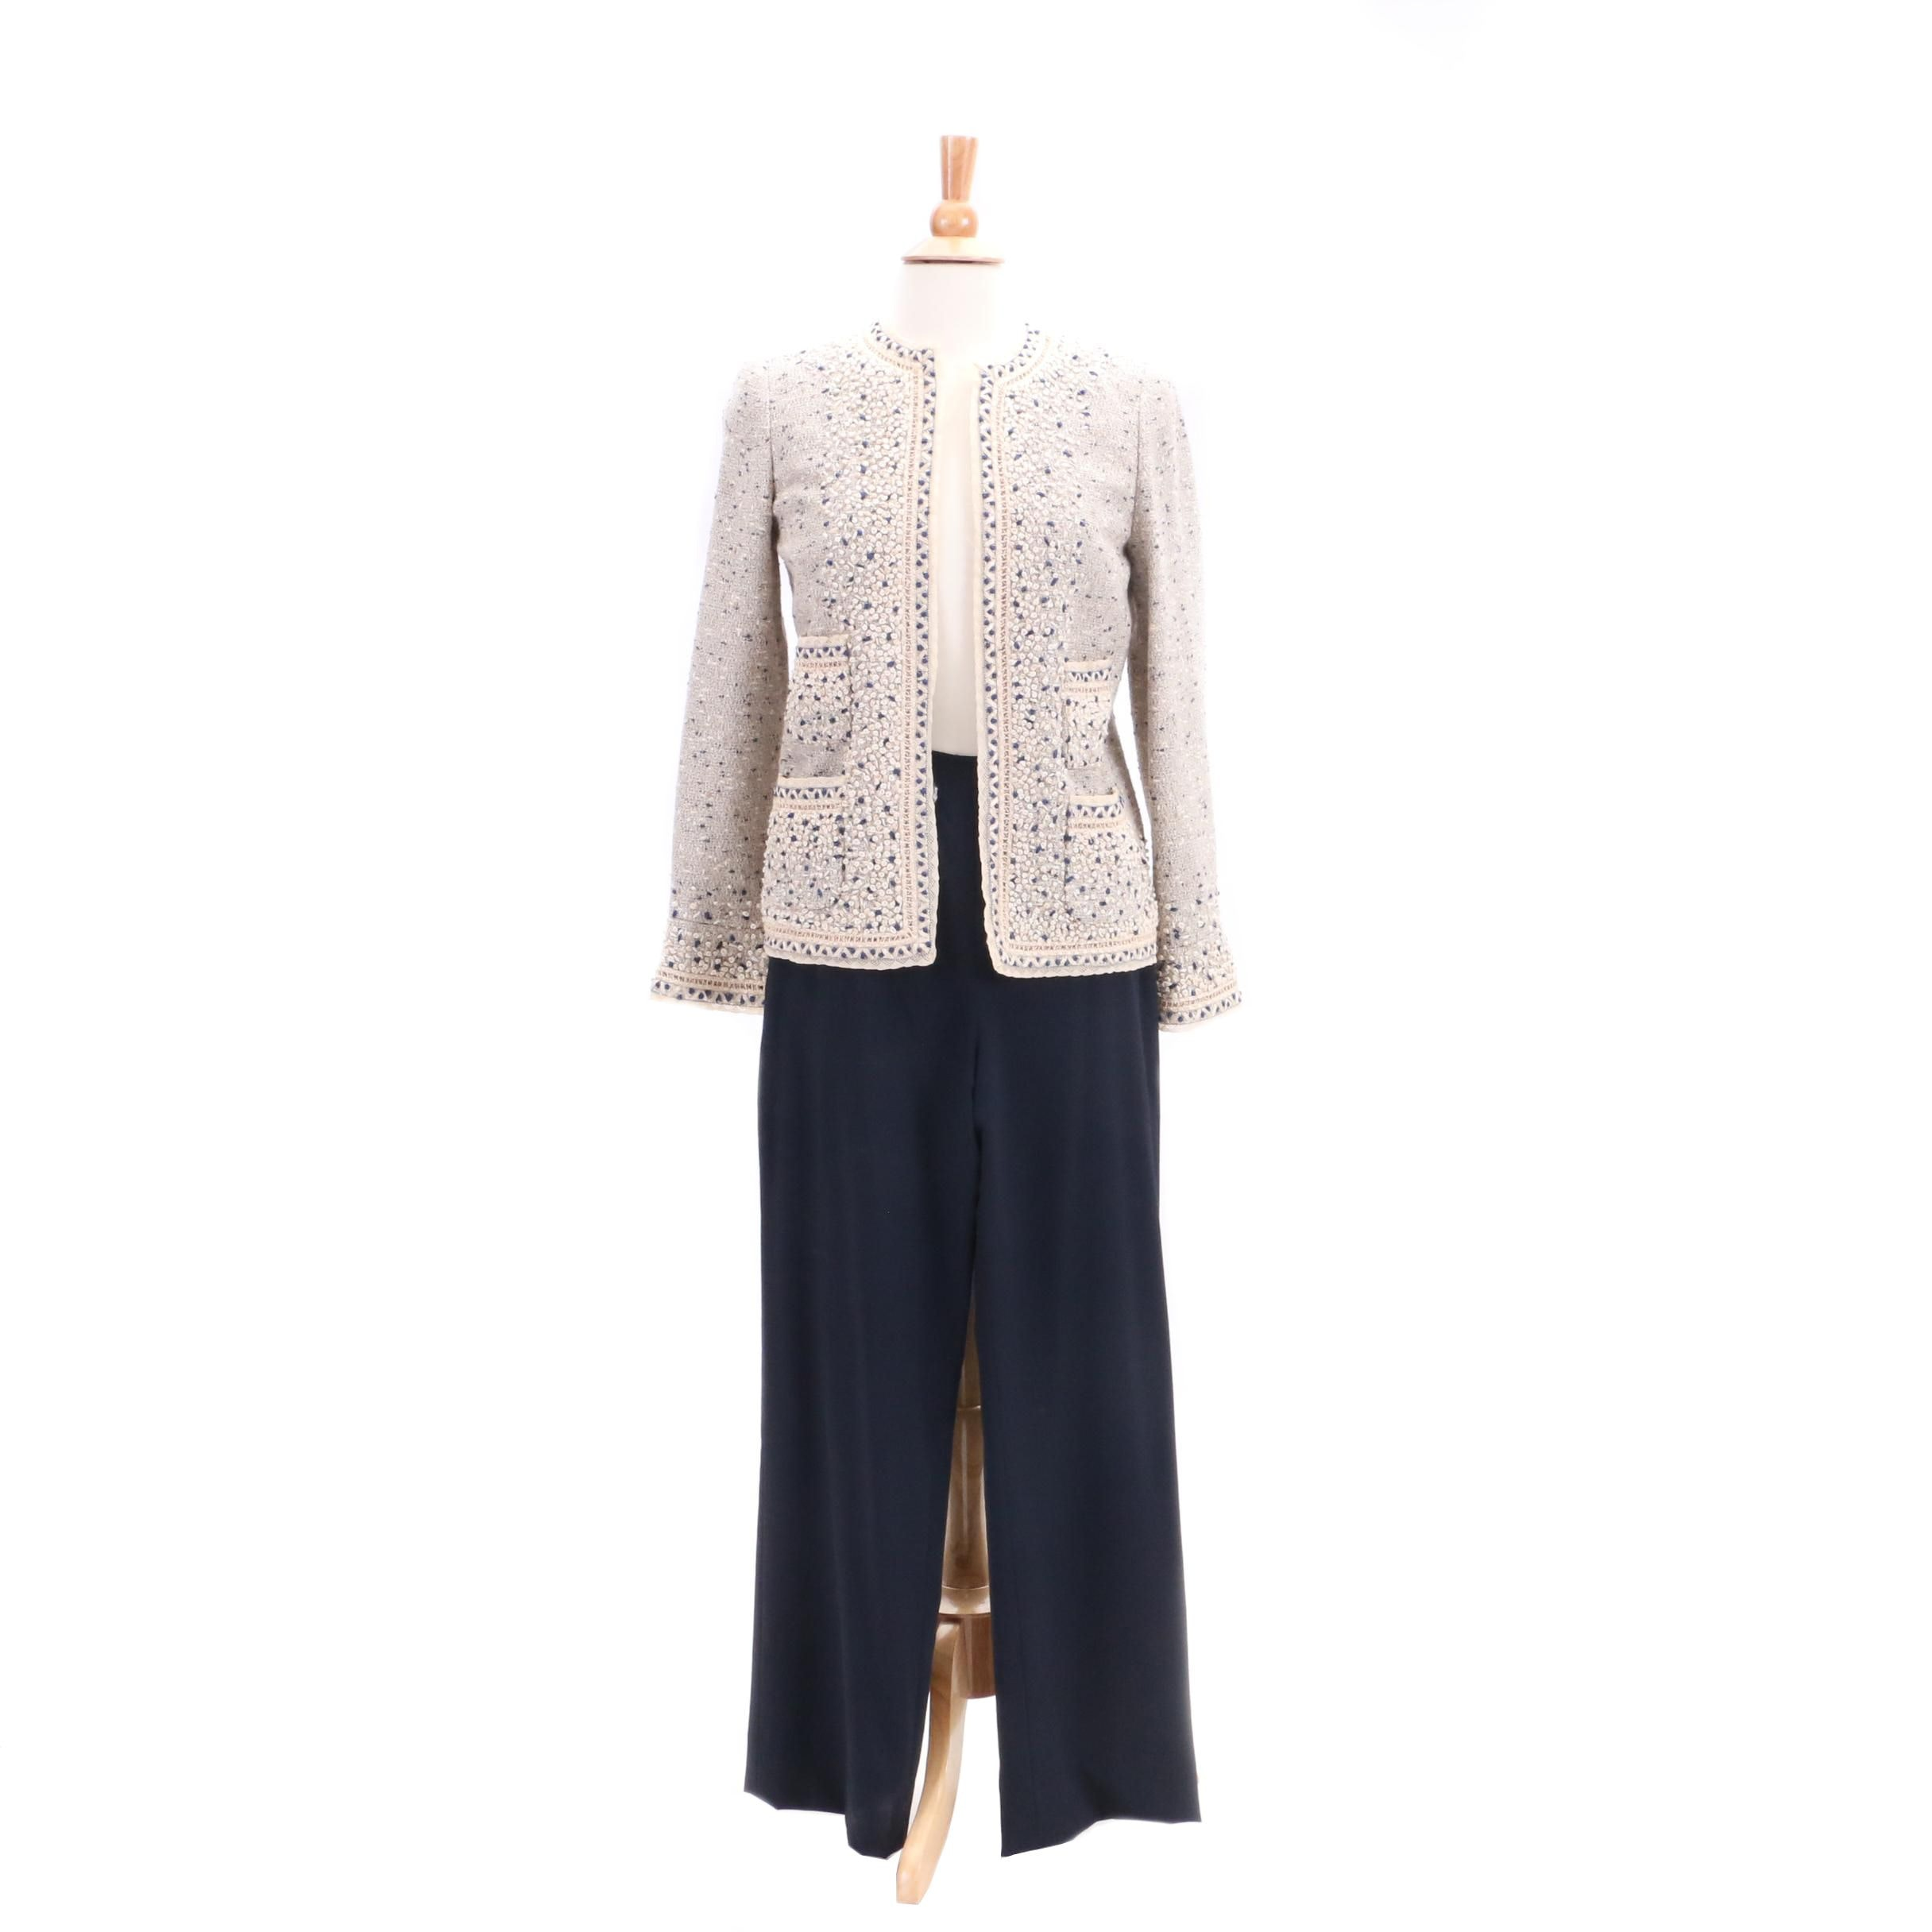 Oscar de la Renta Bouclé Jacket and Wool Trousers